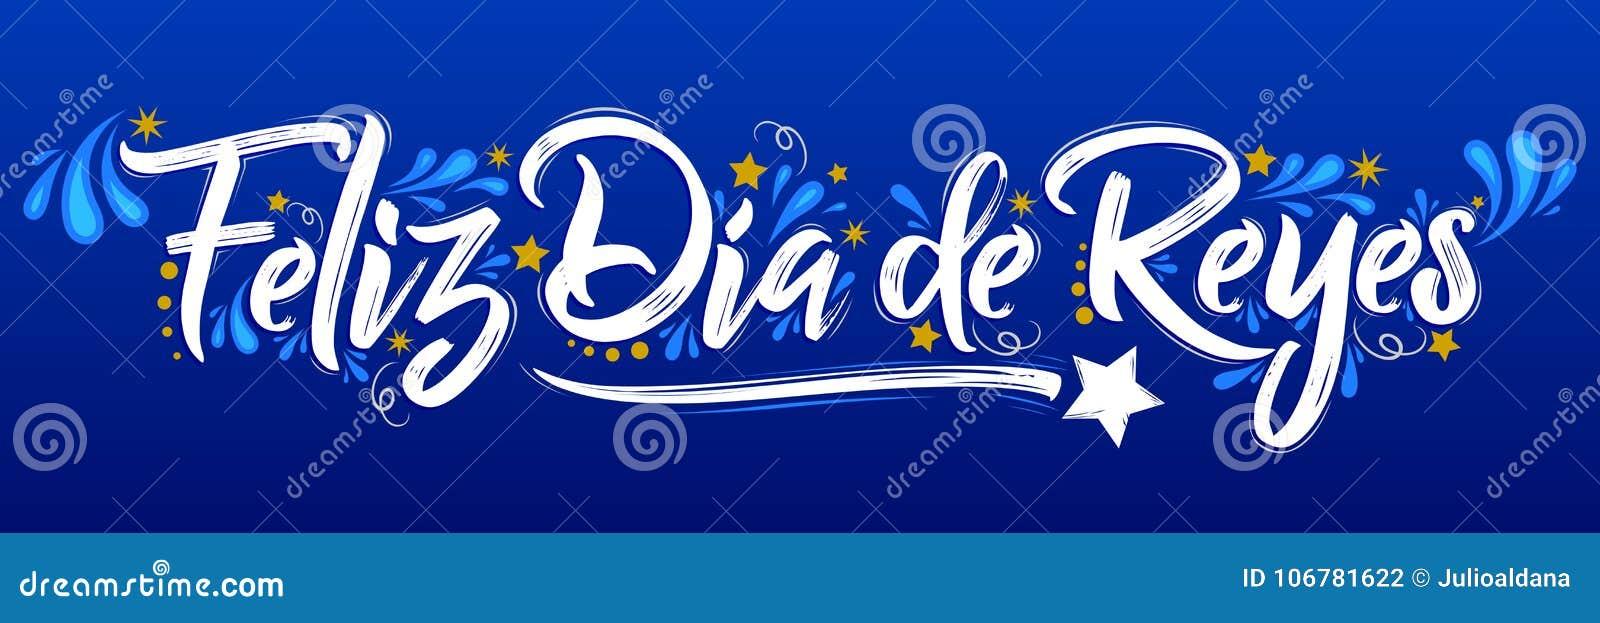 Feliz Dia De Reyes Fotos.Feliz Dia De Reyes Happy Day Of Kings Spanish Text Is A